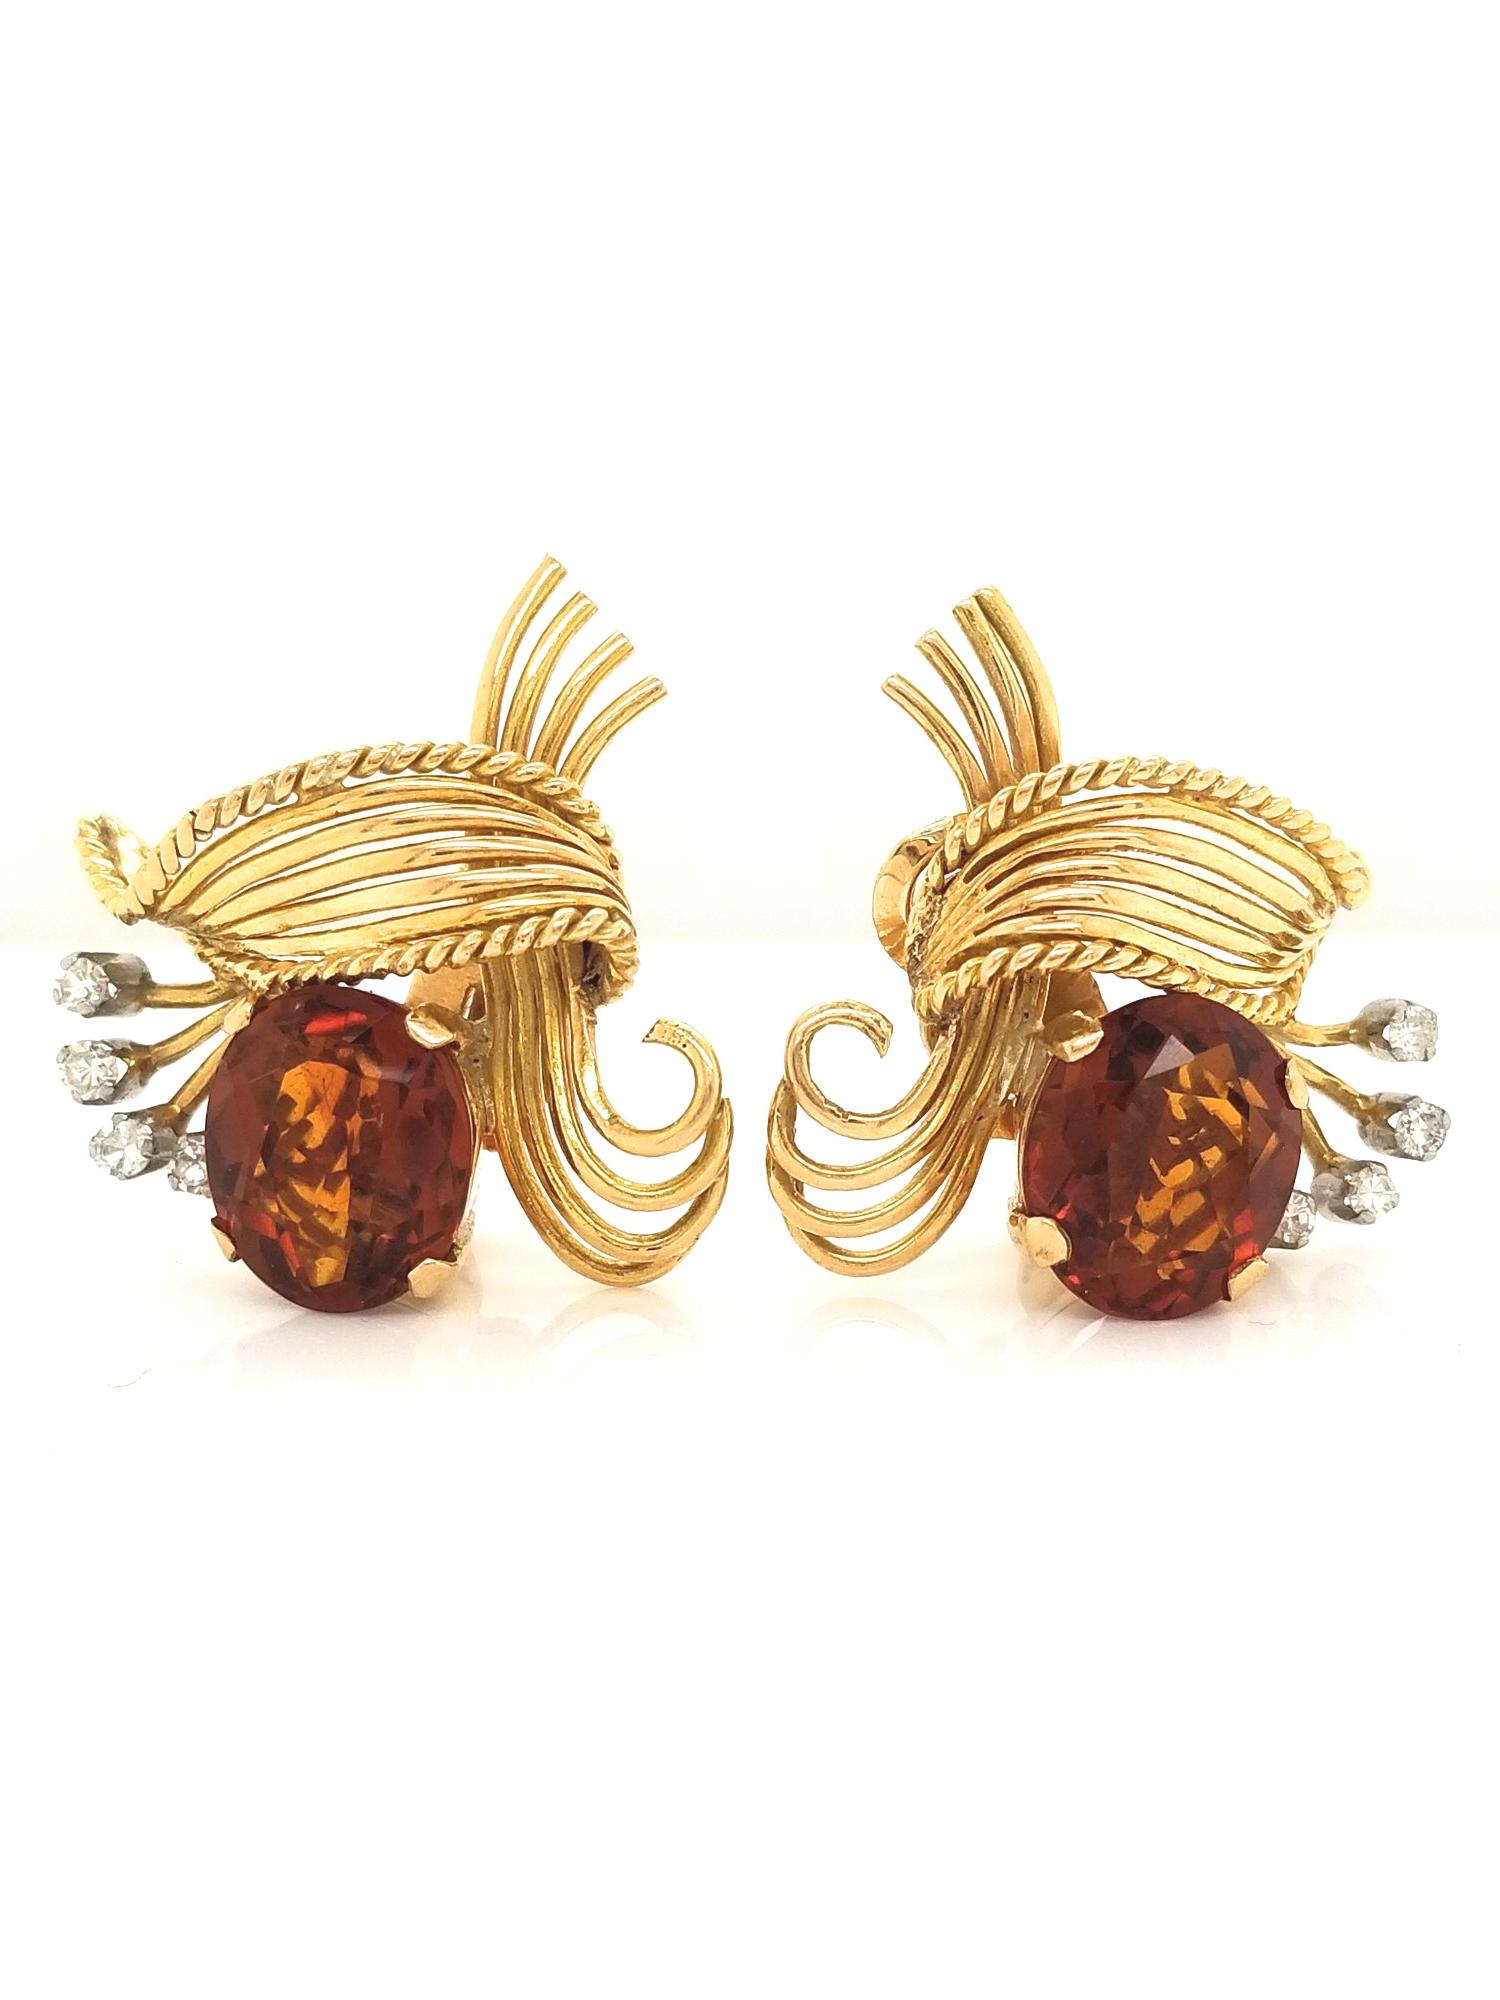 14kt Yellow Gold Oval Madeira Citrine & Diamond Earrings